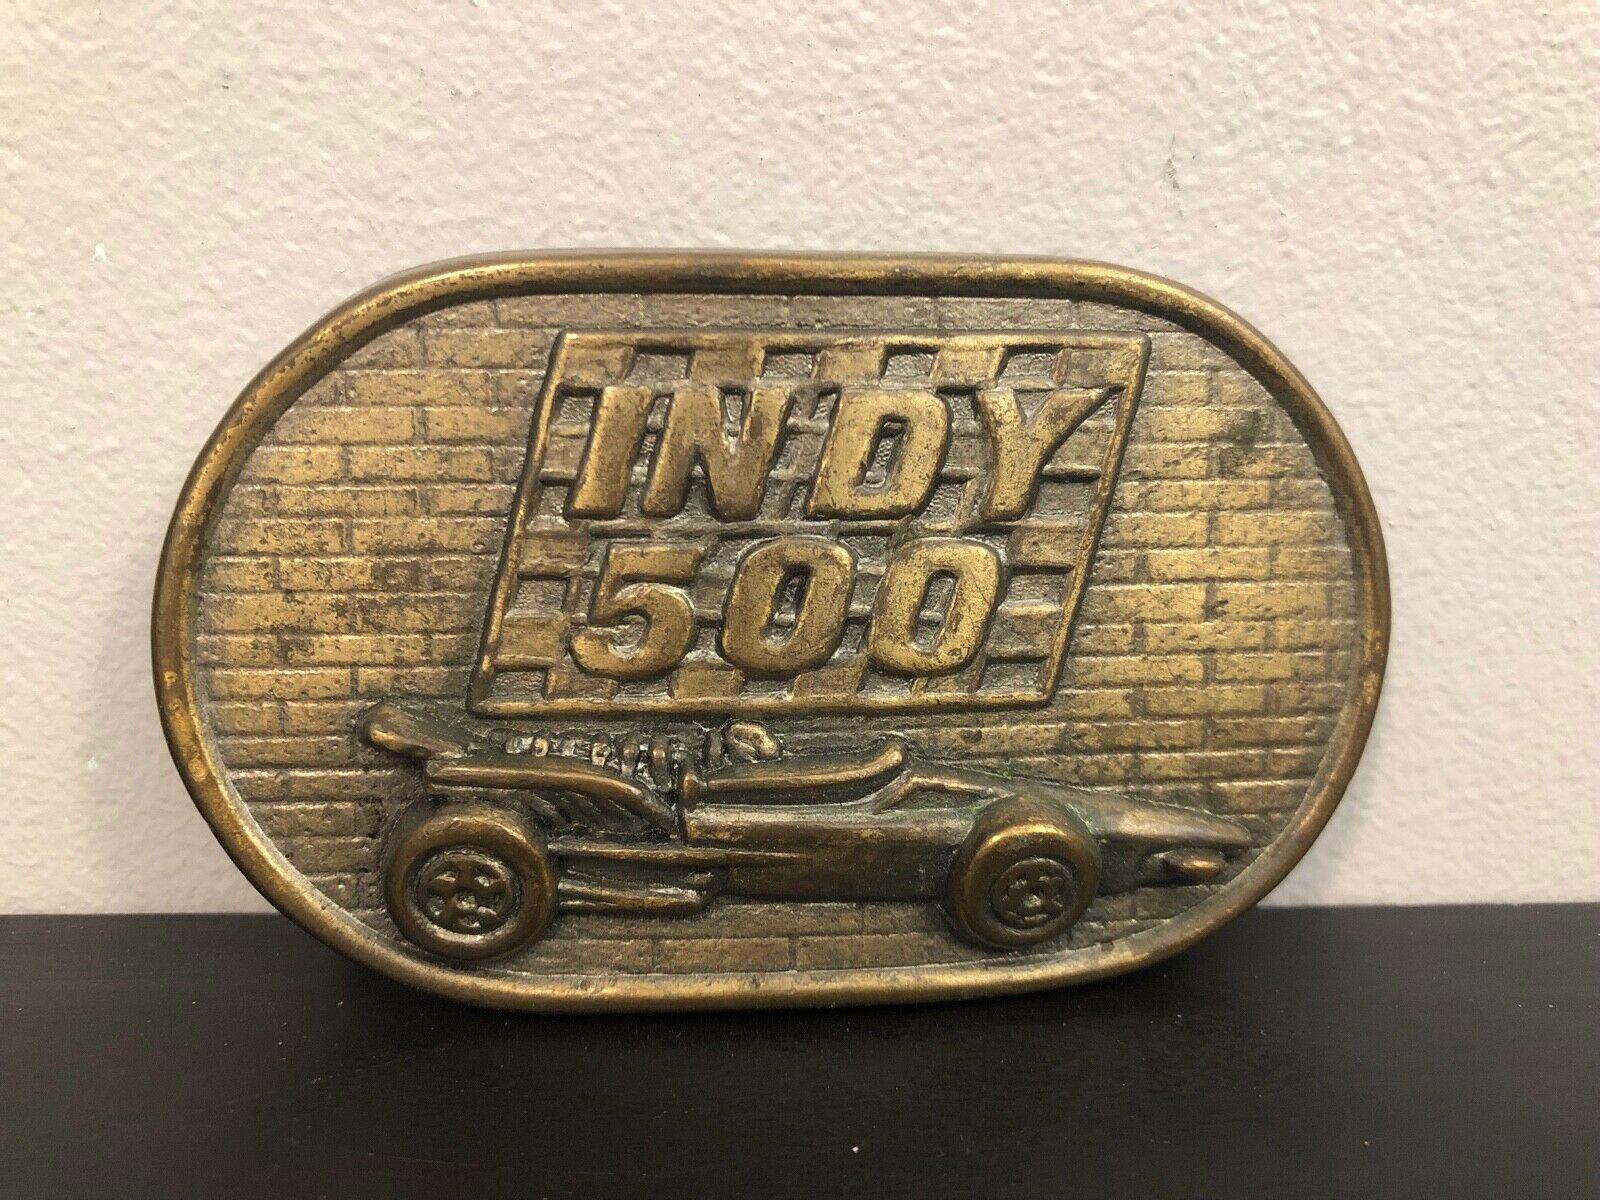 Brass Indy 500 Belt Buckle Race Racing Car Design 3 1/2